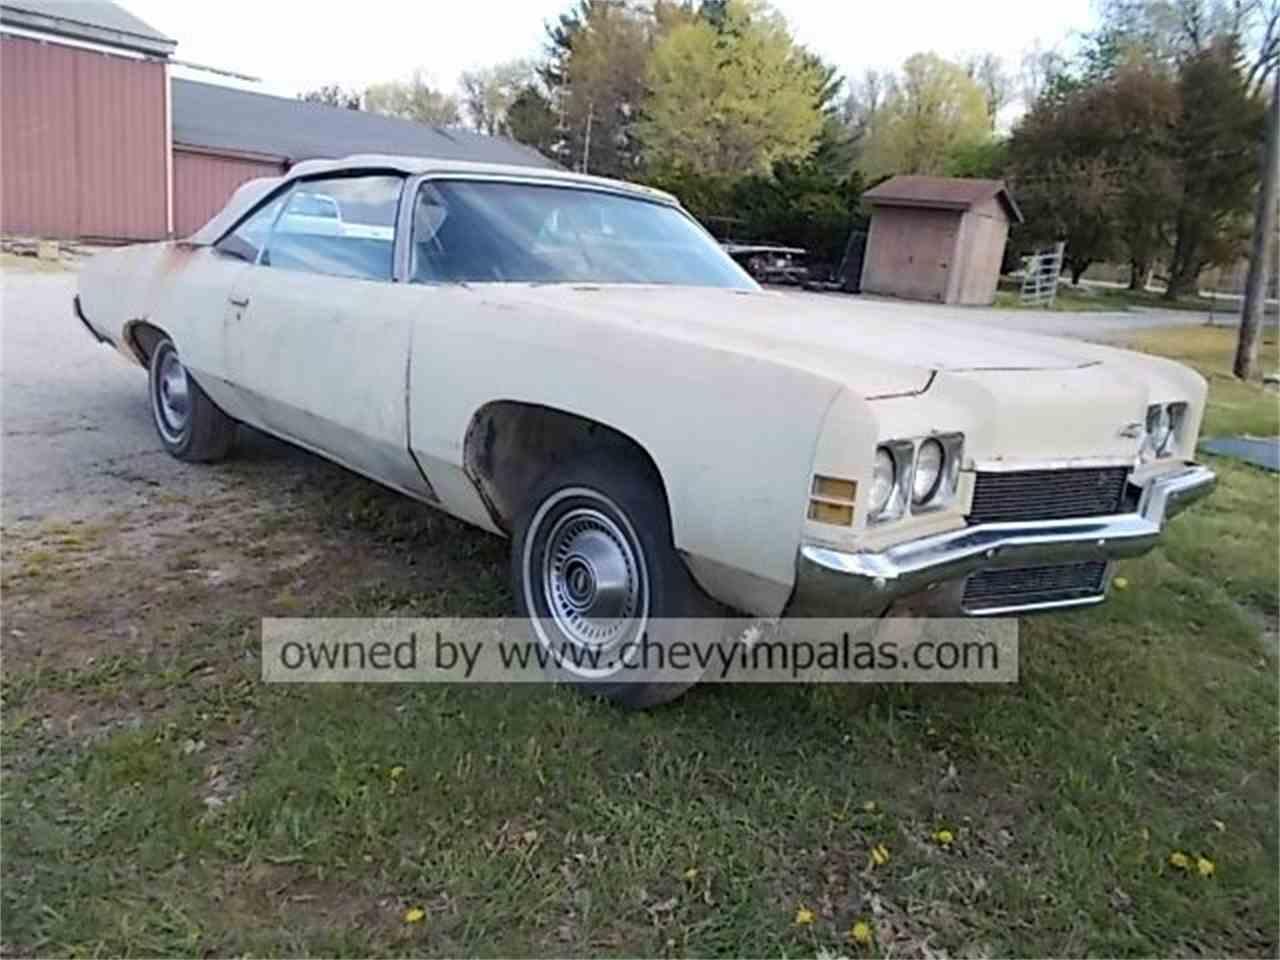 Impala 1972 chevrolet impala for sale : 1972 Chevrolet Impala for Sale | ClassicCars.com | CC-979332